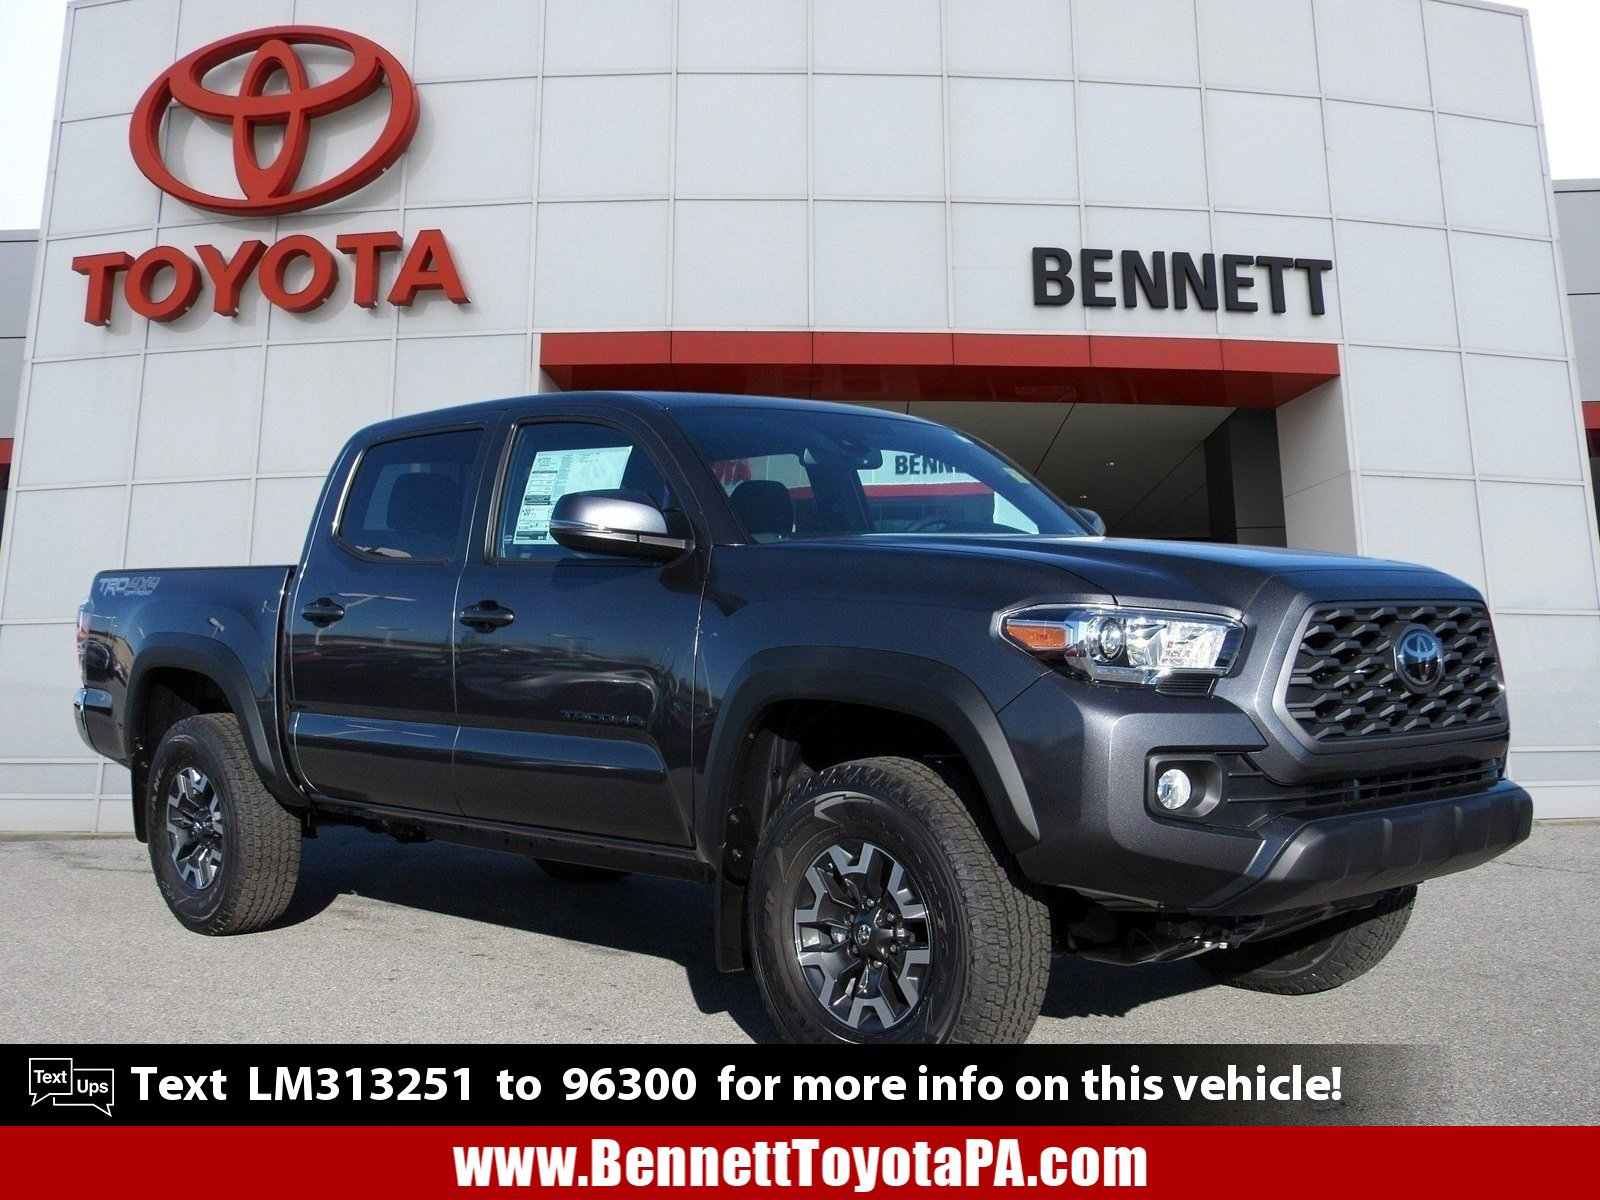 New 2020 Toyota Tacoma TRD Off Road